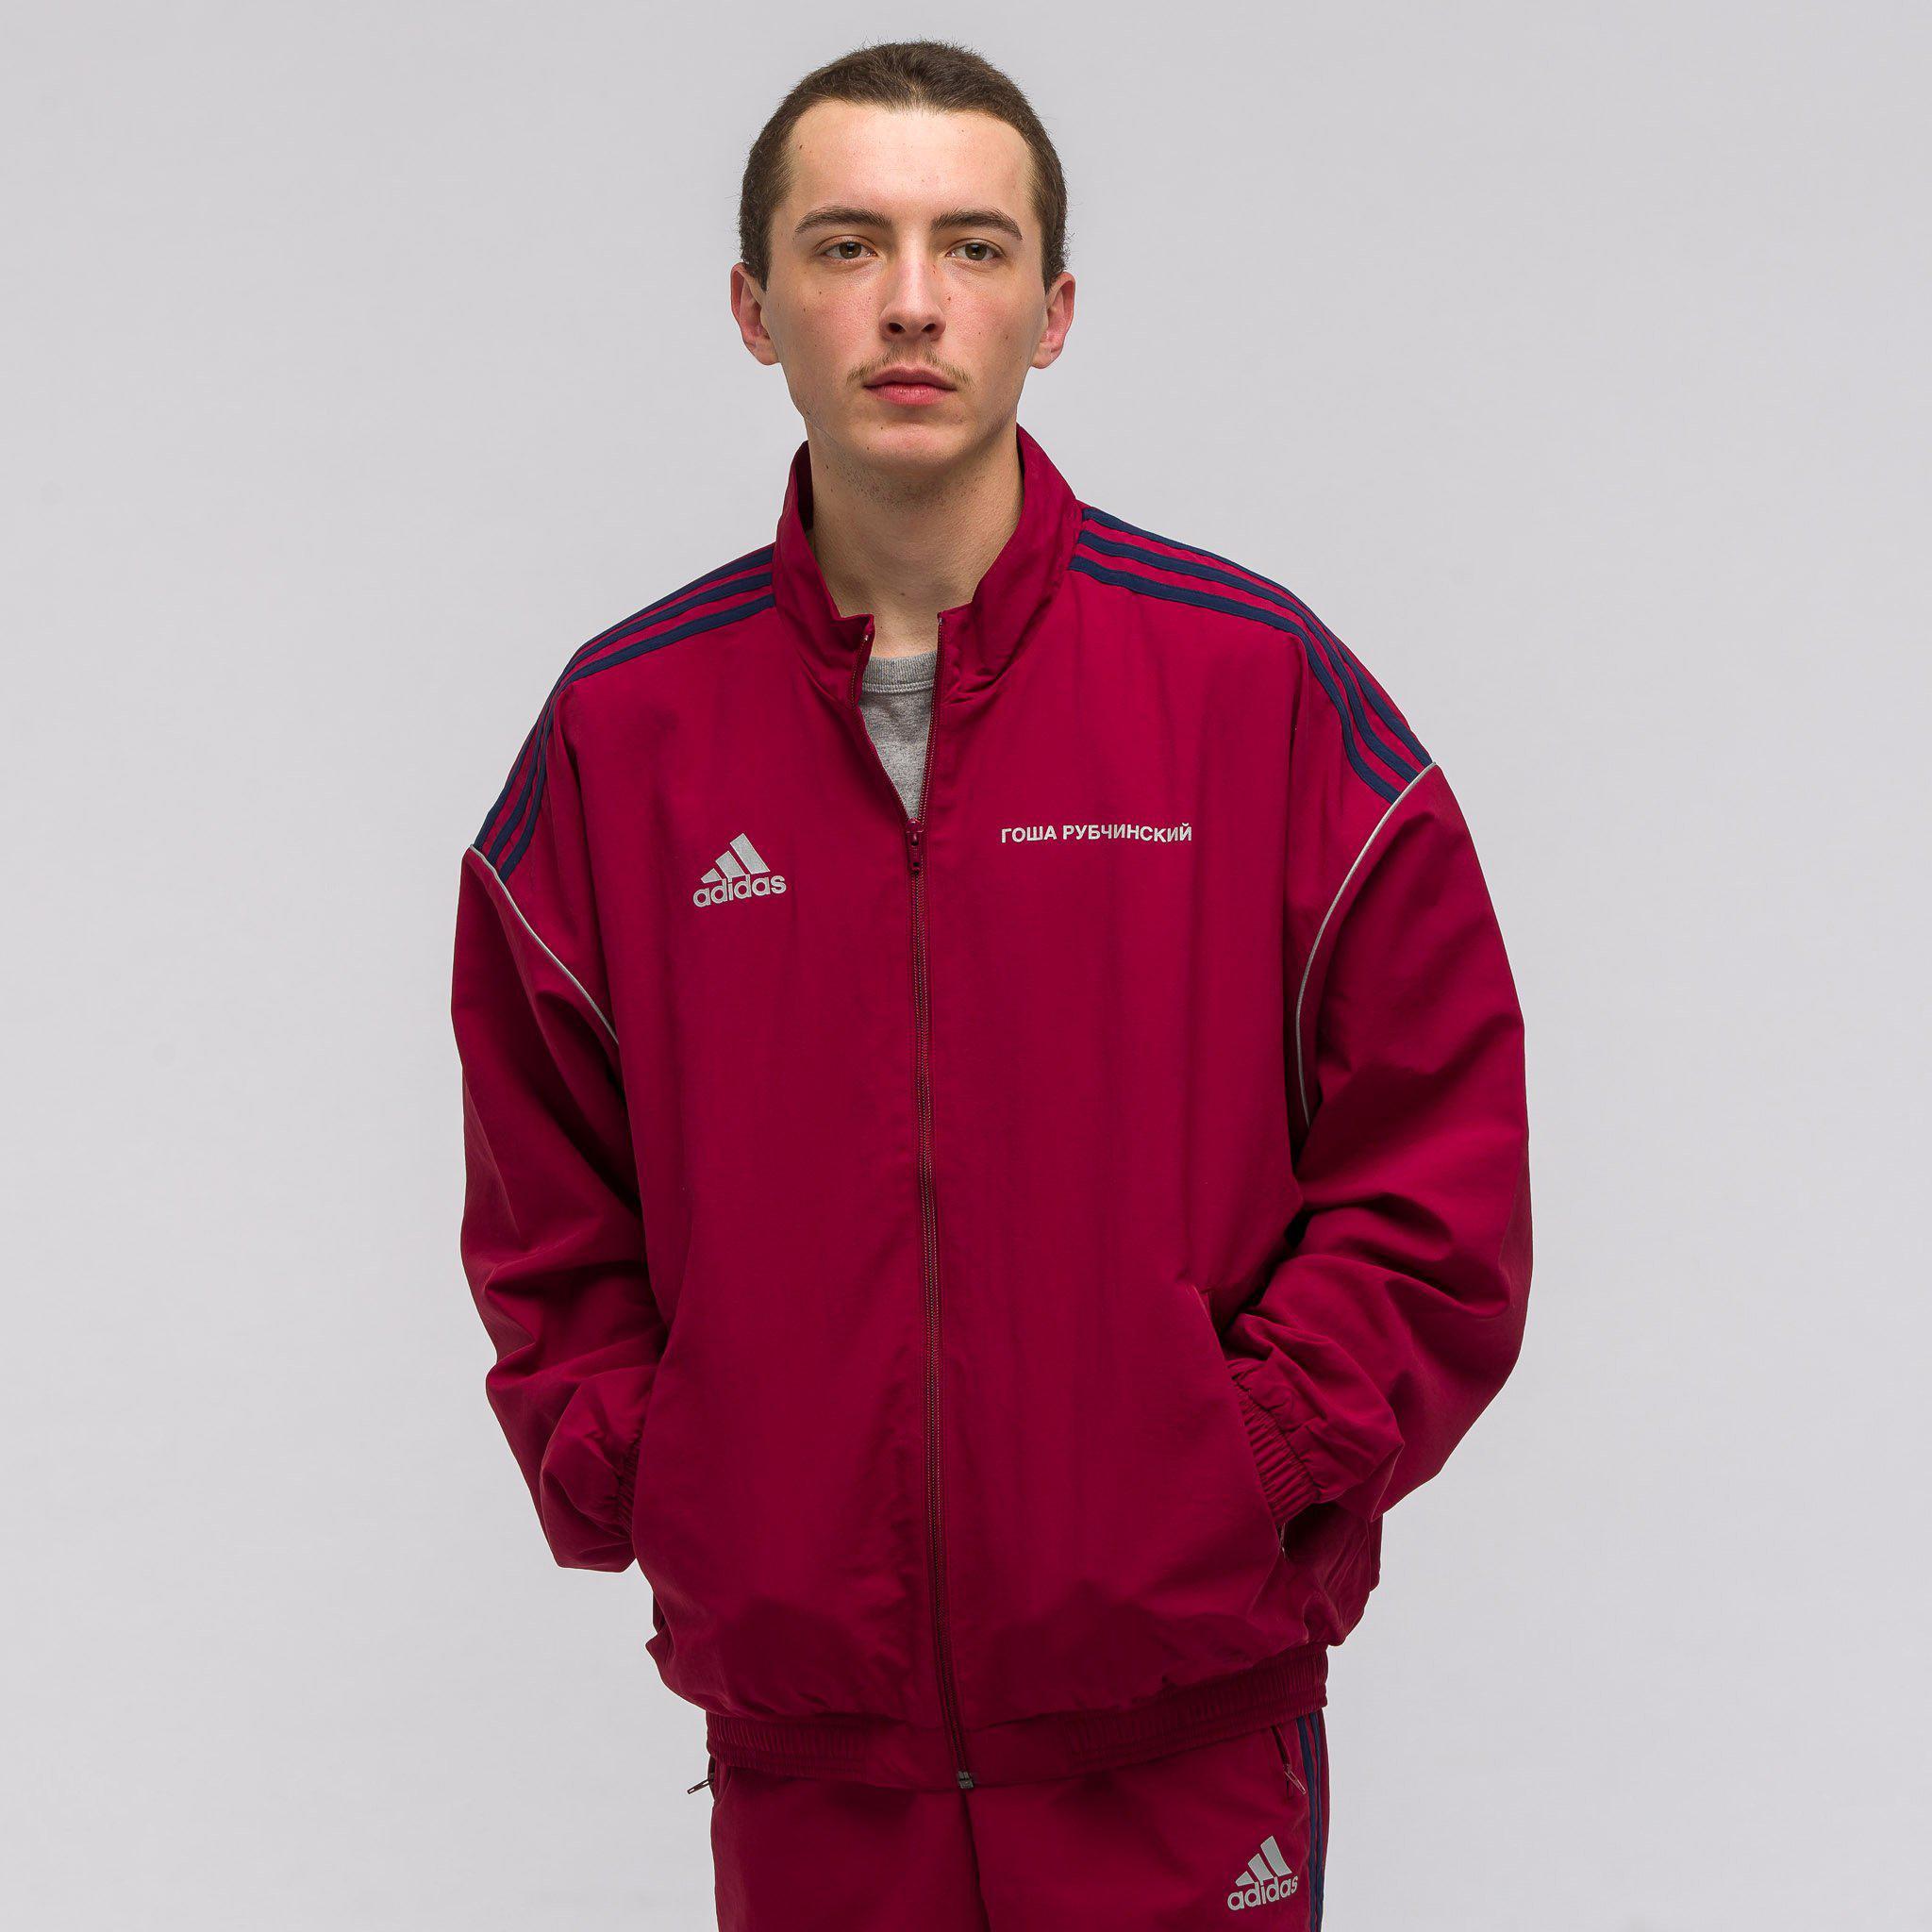 6a054a56 Gosha Rubchinskiy X Adidas Track Jacket In Burgundy in Red for Men ...